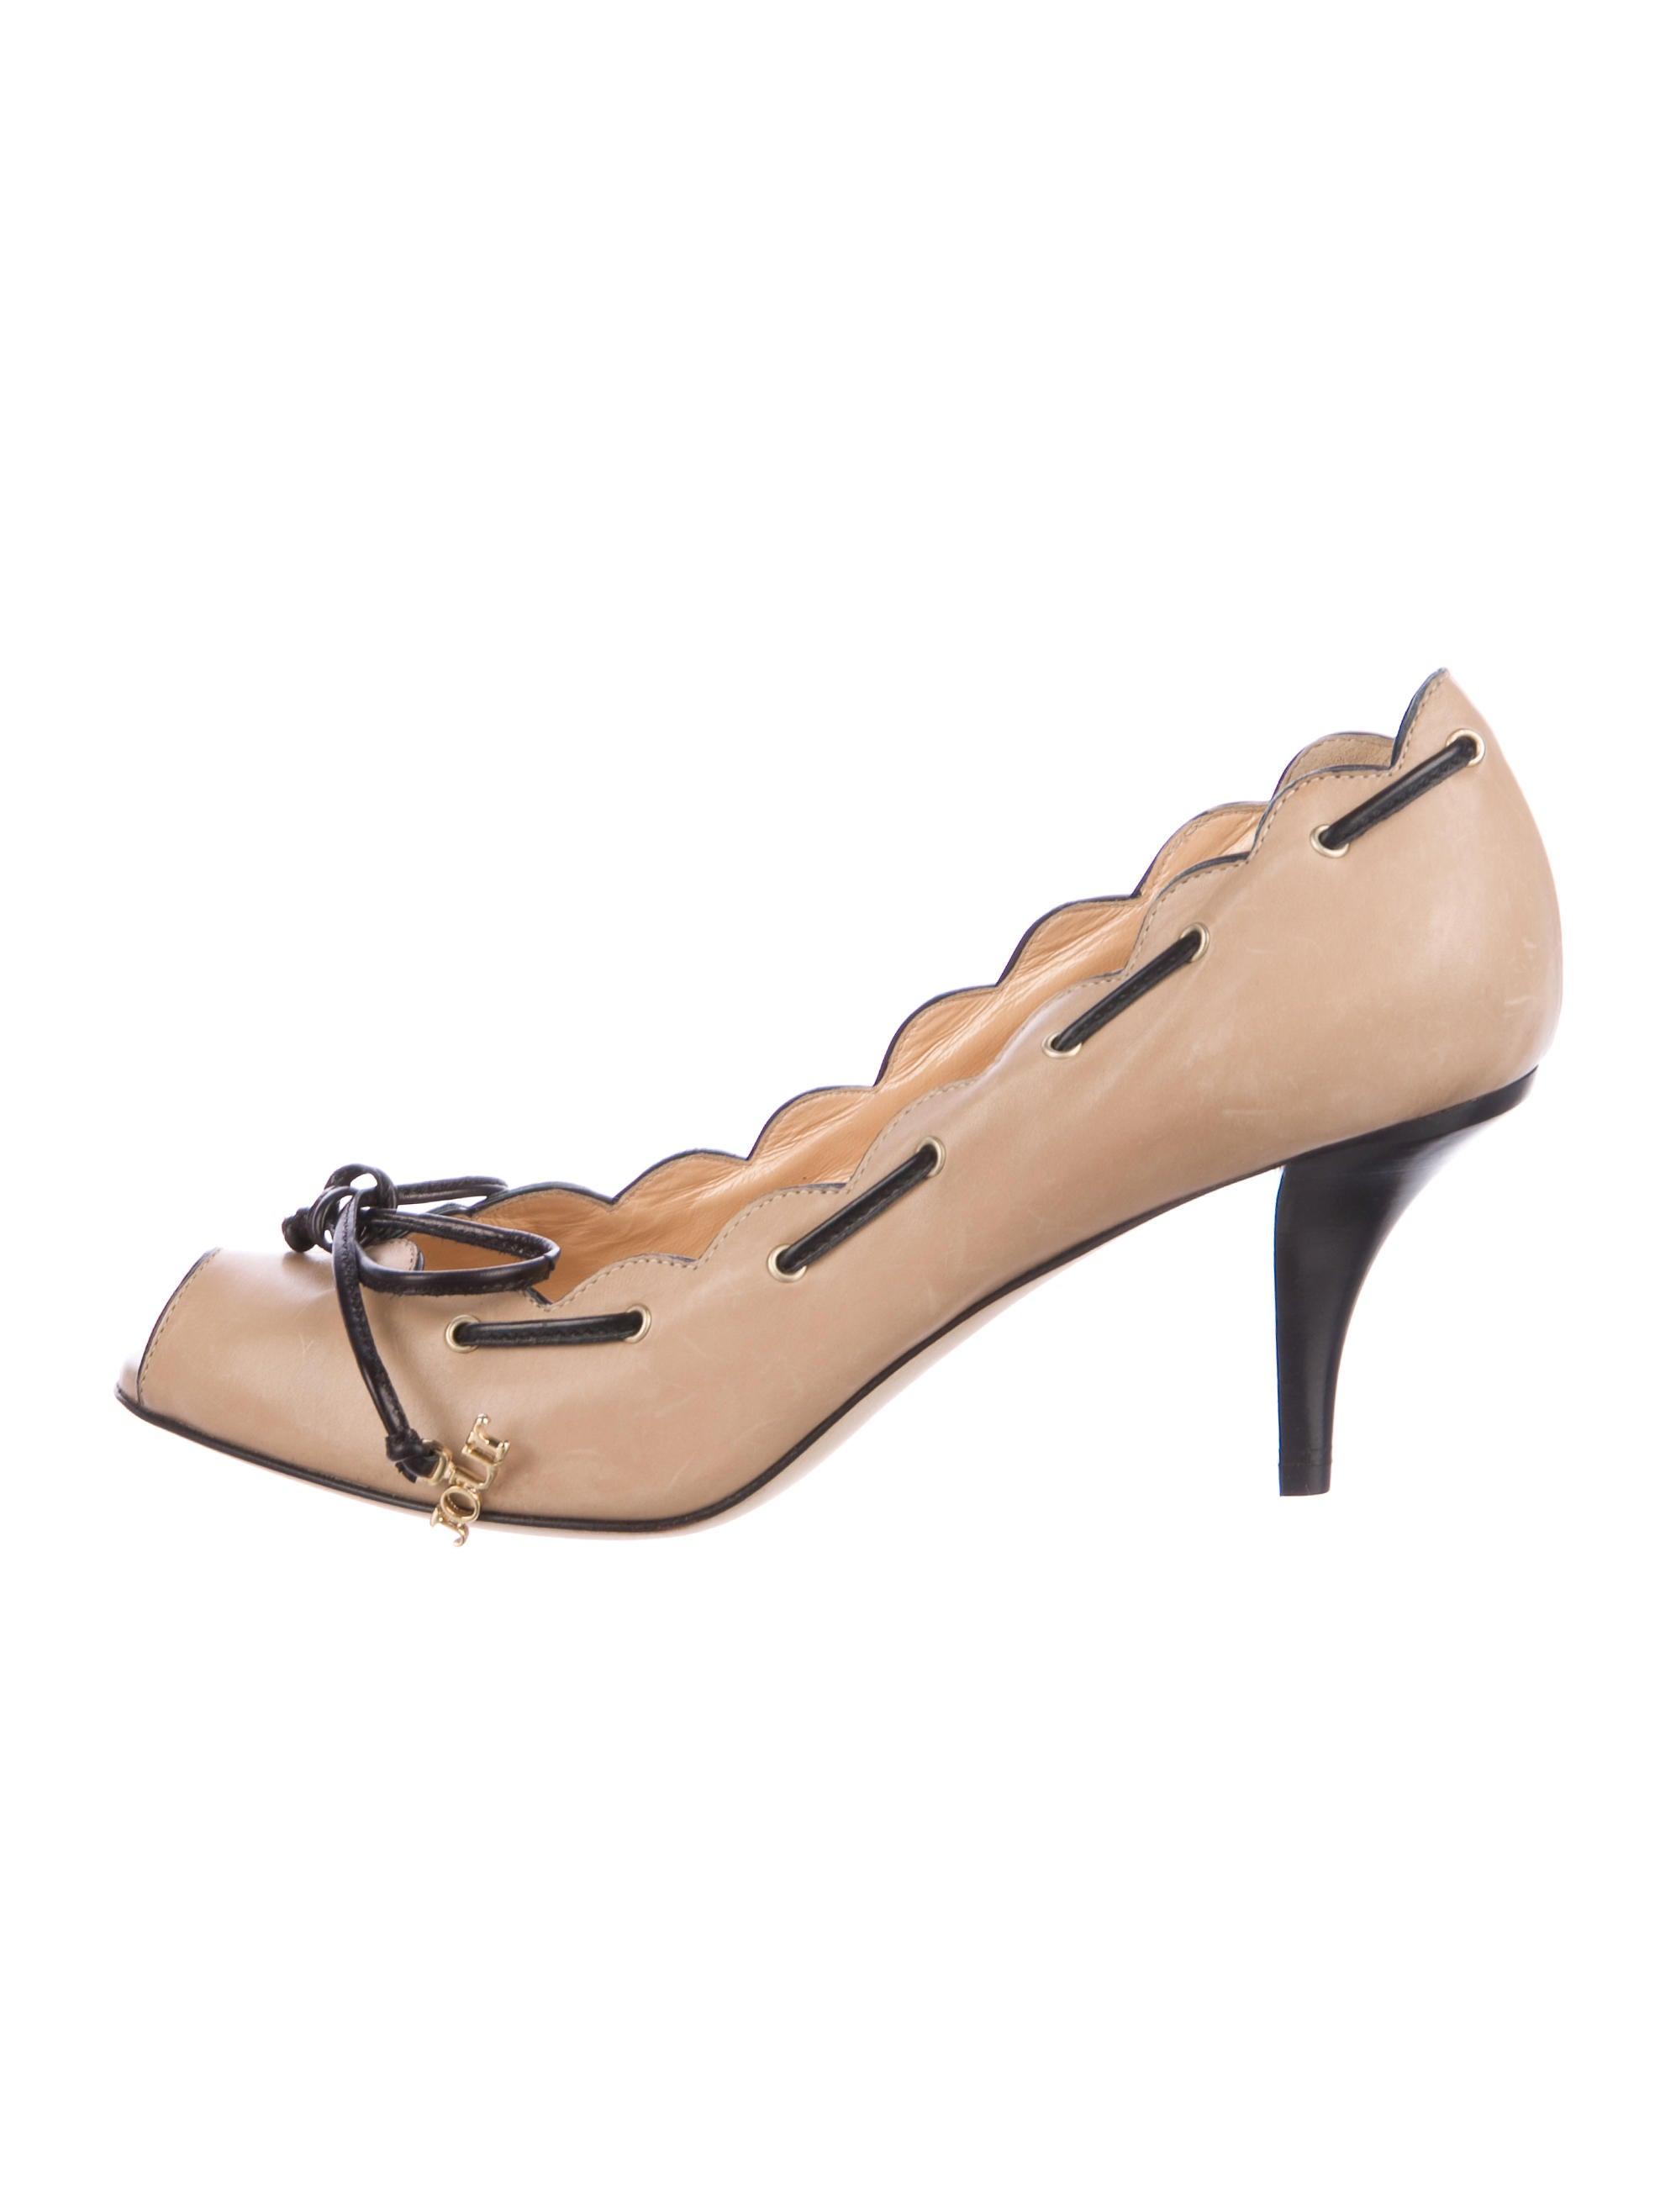 discount low price cheap sale explore O Jour Peep-Toe Slingback Sandals buy cheap great deals discount outlet store 1Pbc3WzTWB